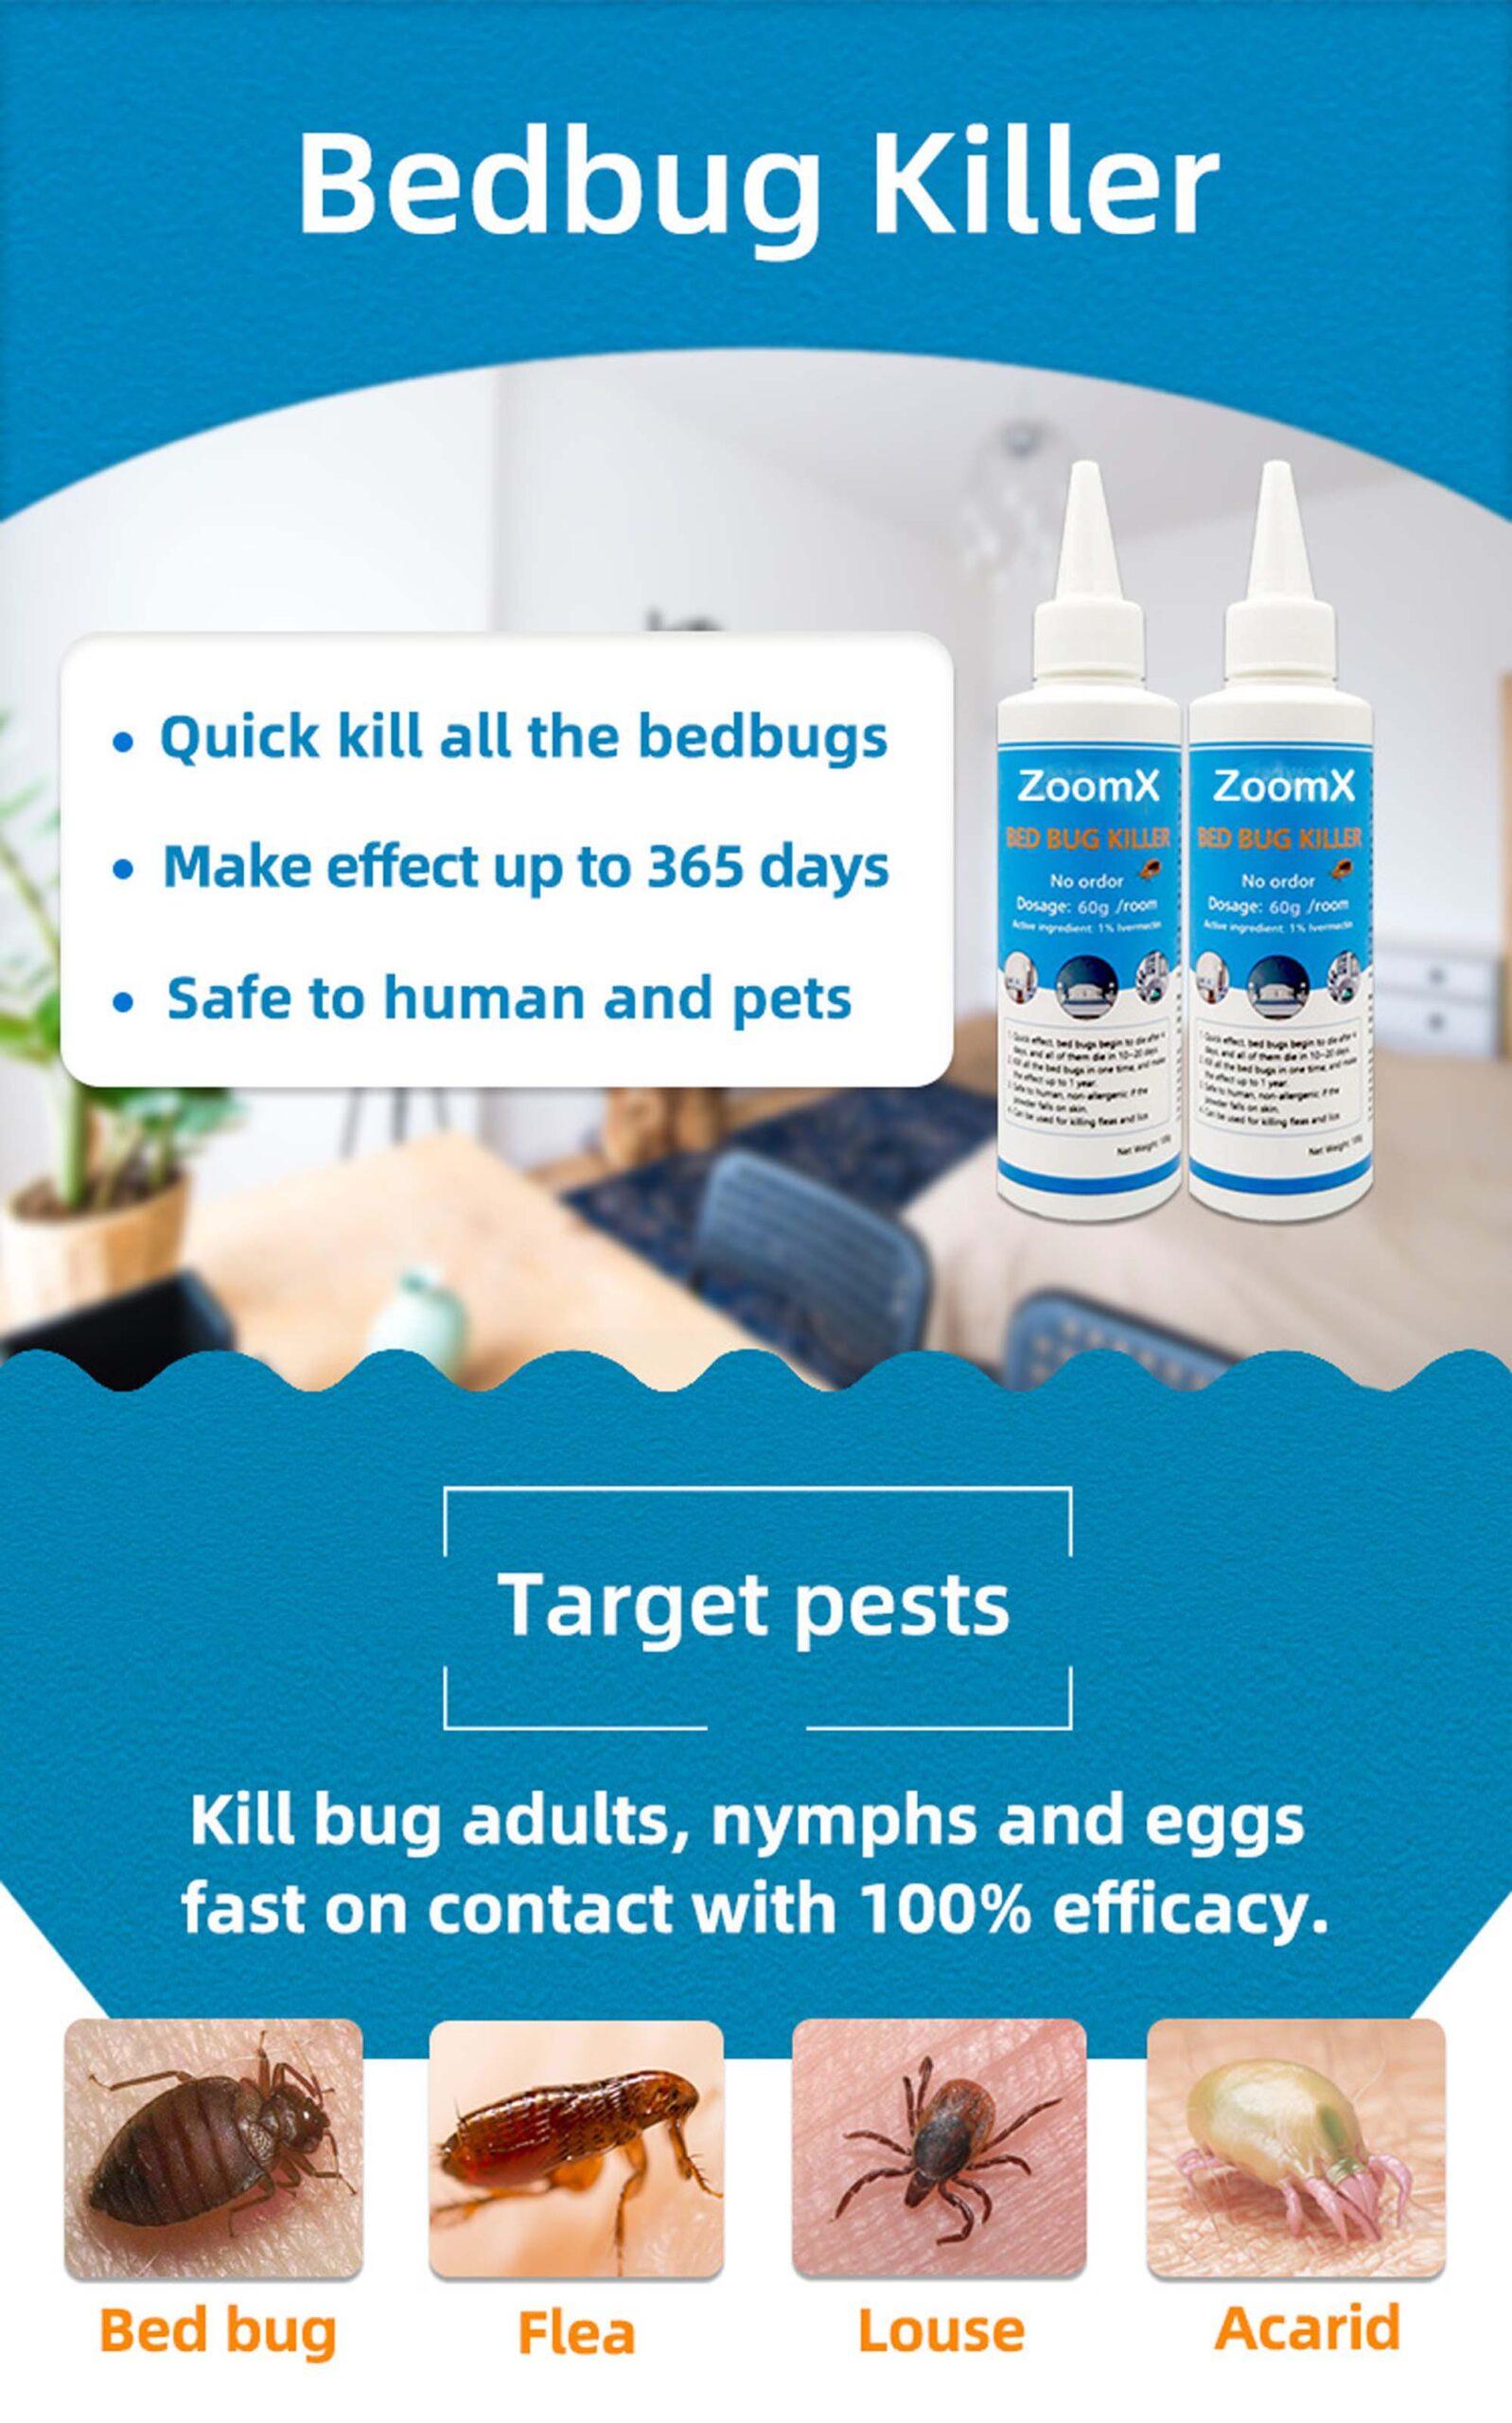 zoomx bedbugs killer ছারপোকা মারার ওষুধ